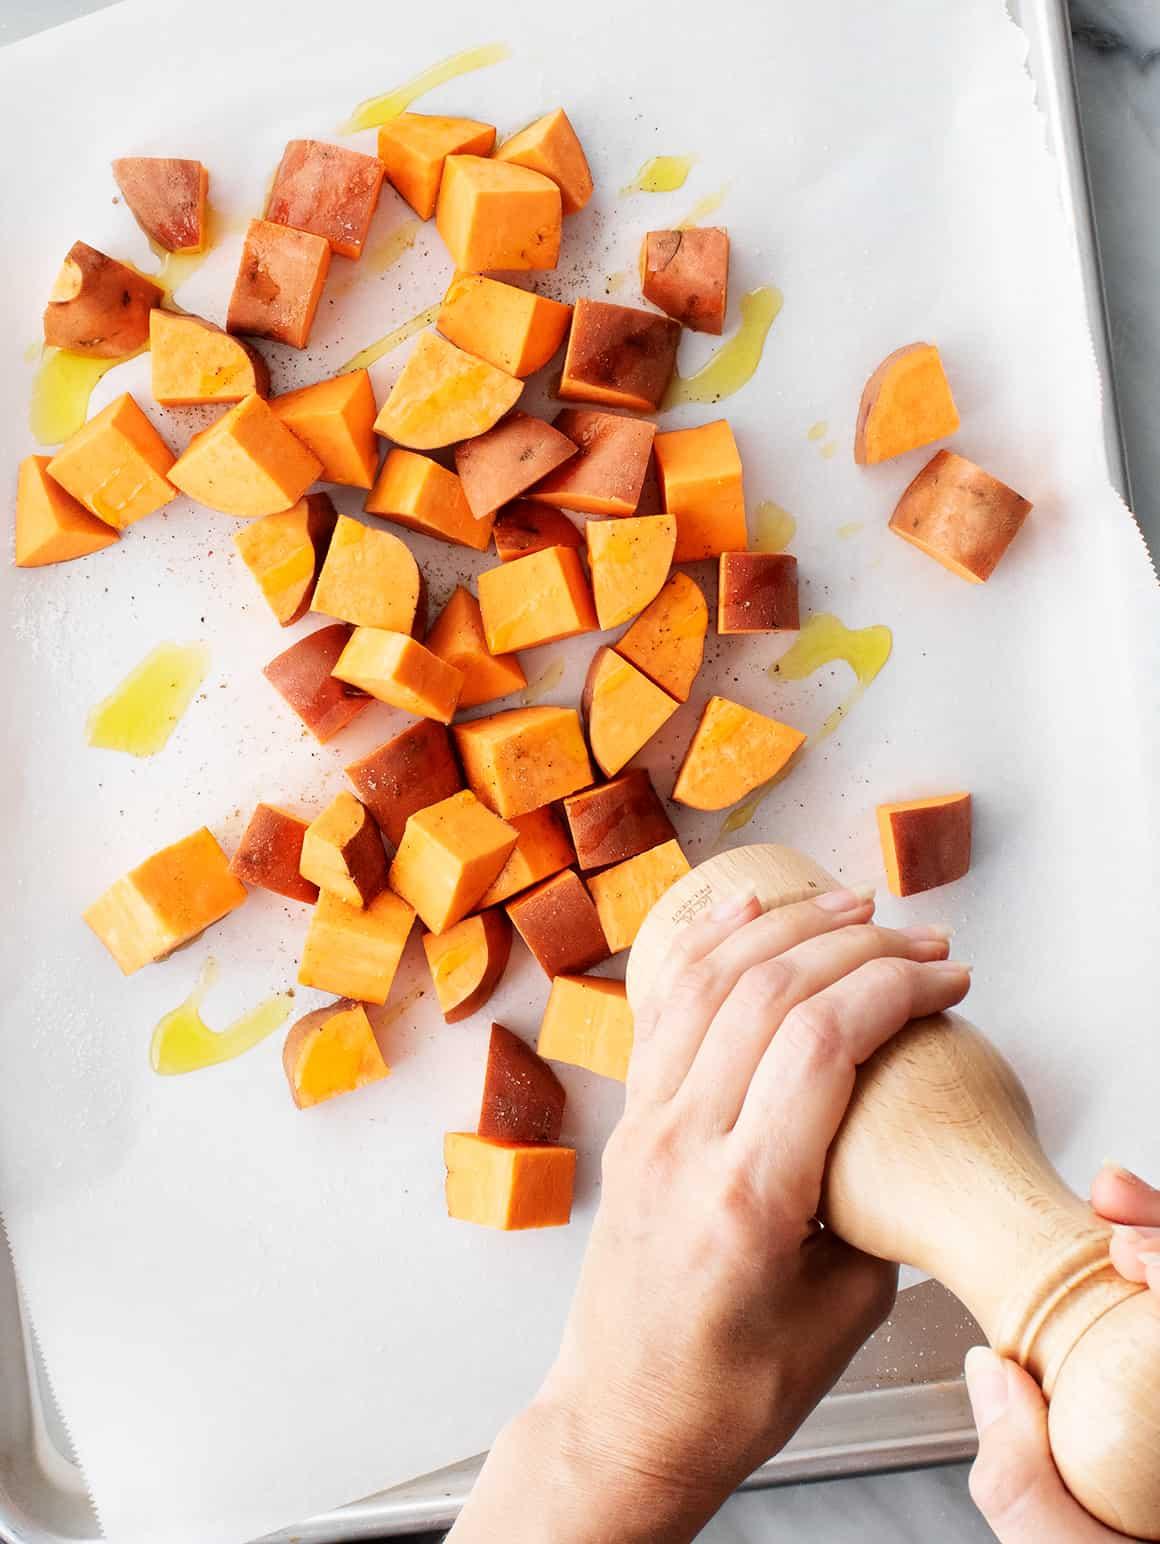 Hands seasoning sweet potato cubes with black pepper